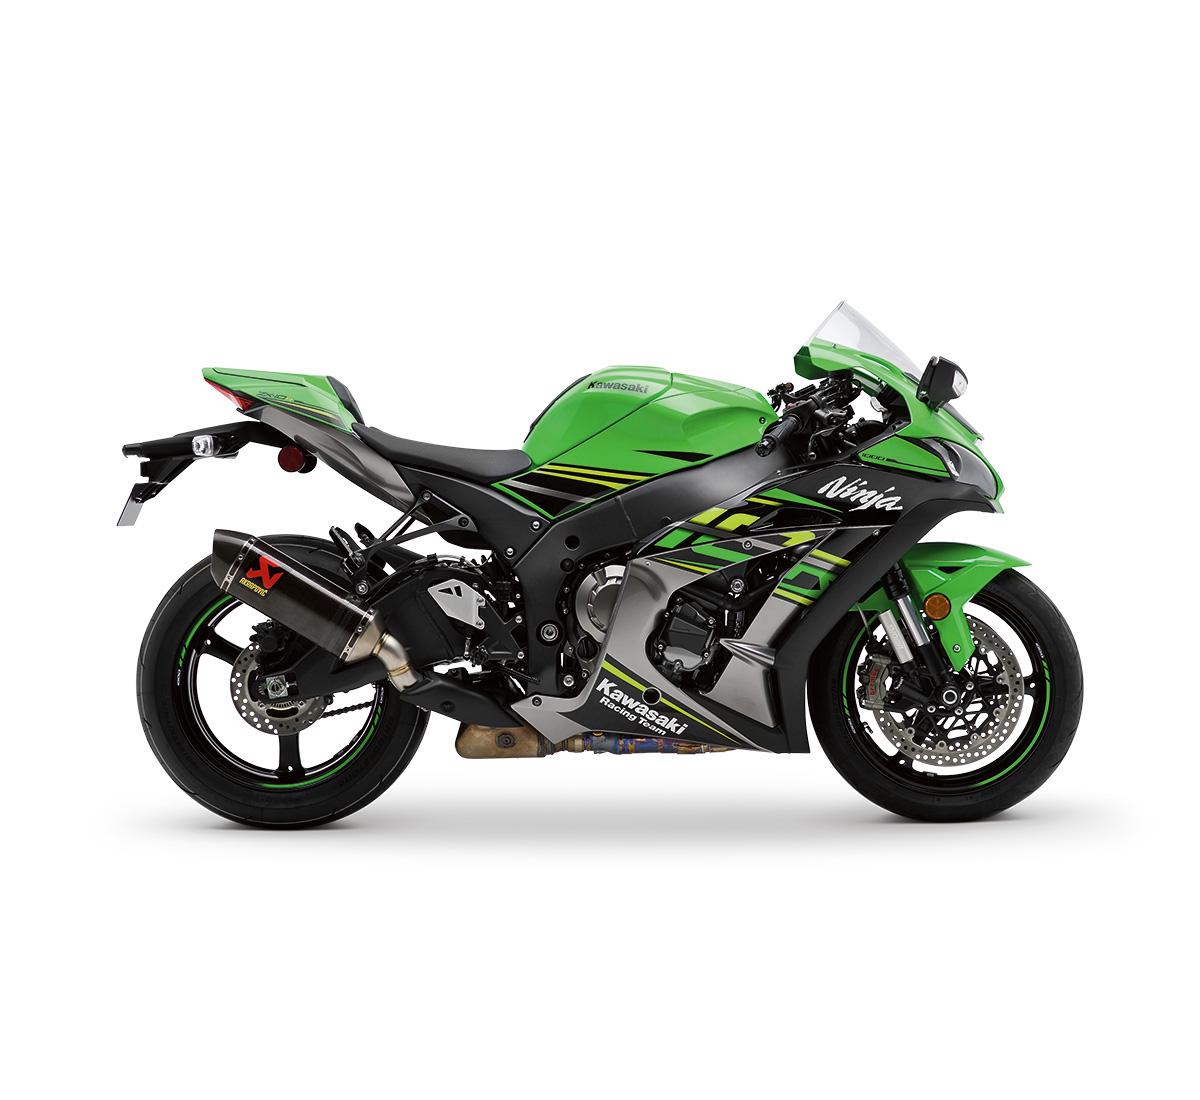 Motorcycle Ninja Zx 10r Akrapovic Slip On Exhaust